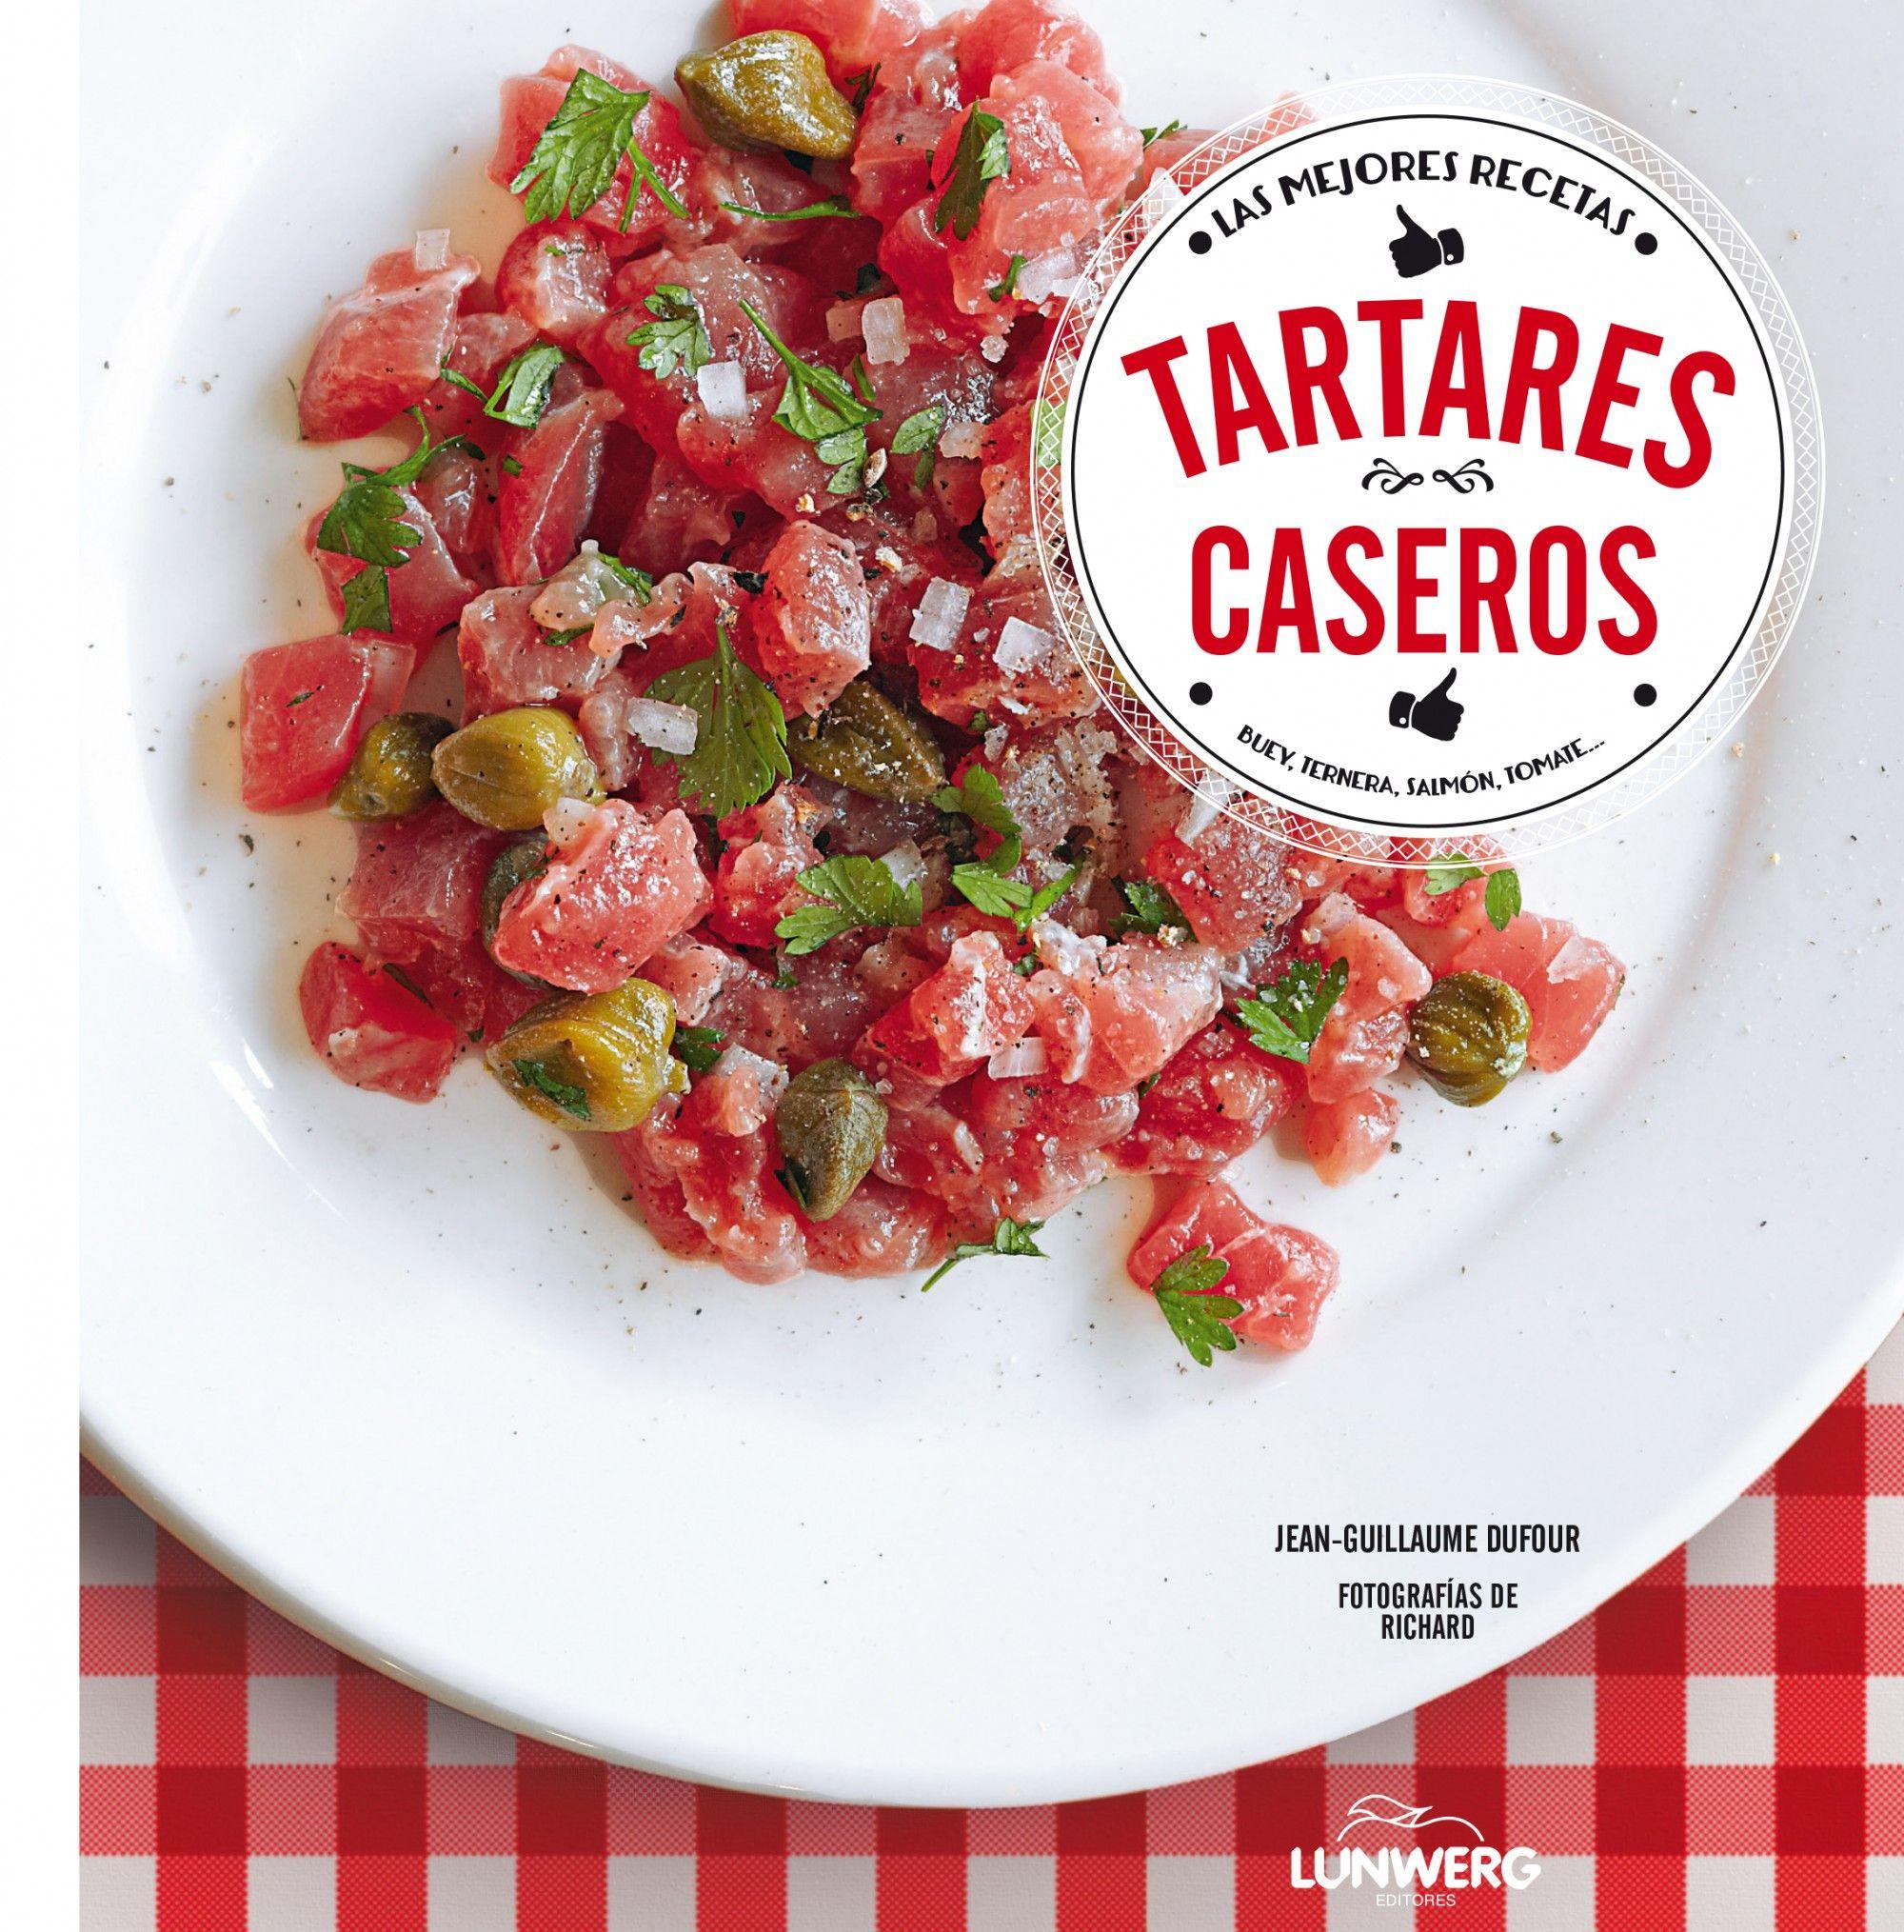 TARTARES CASEROS